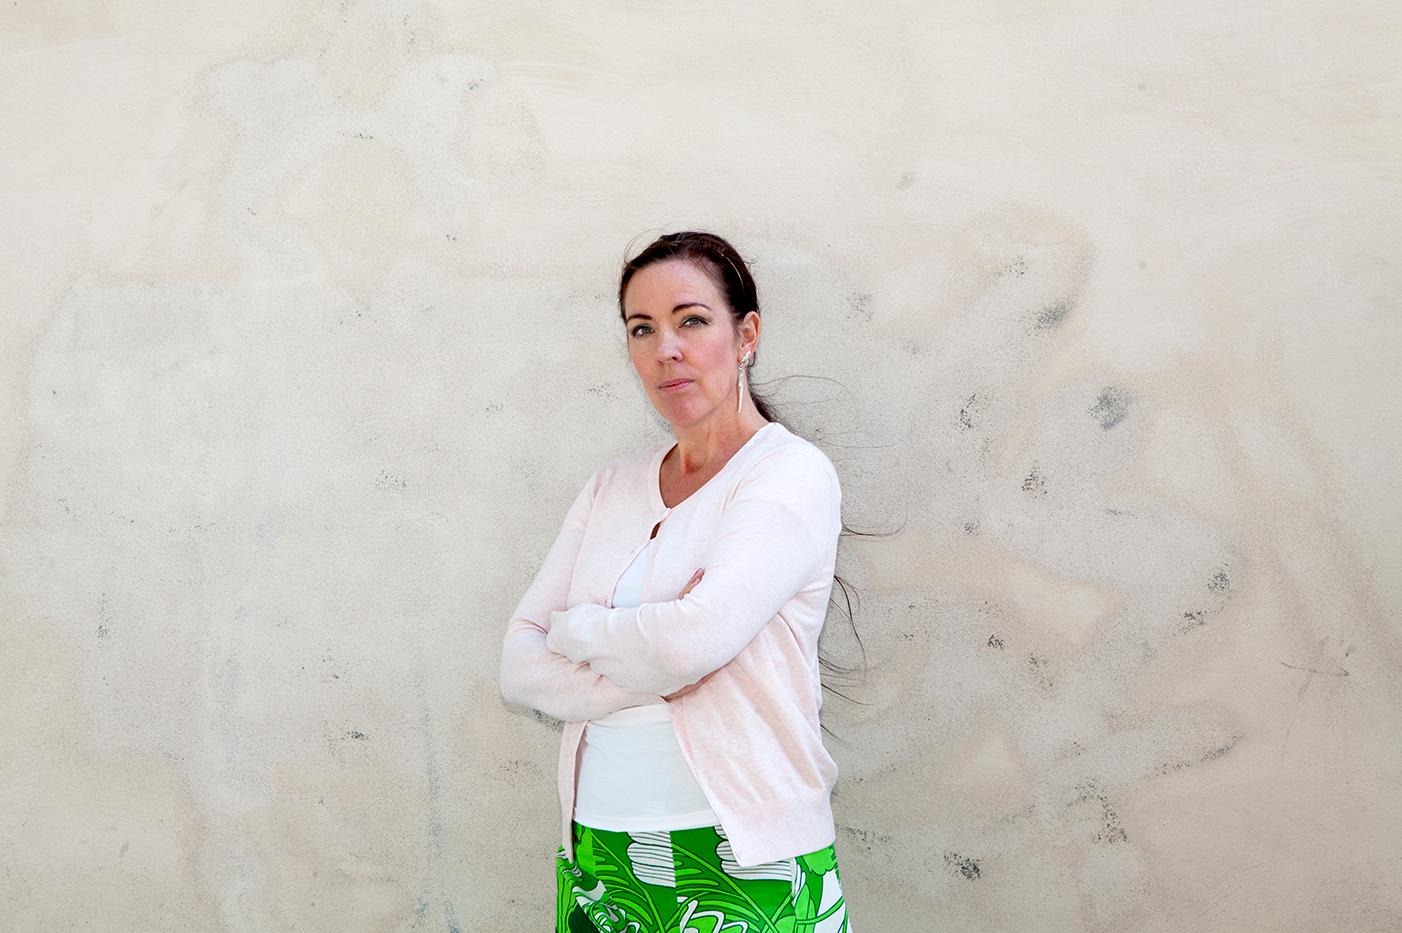 Roks ordförande Jenny Westerstrand. Foto: Frida Ekman